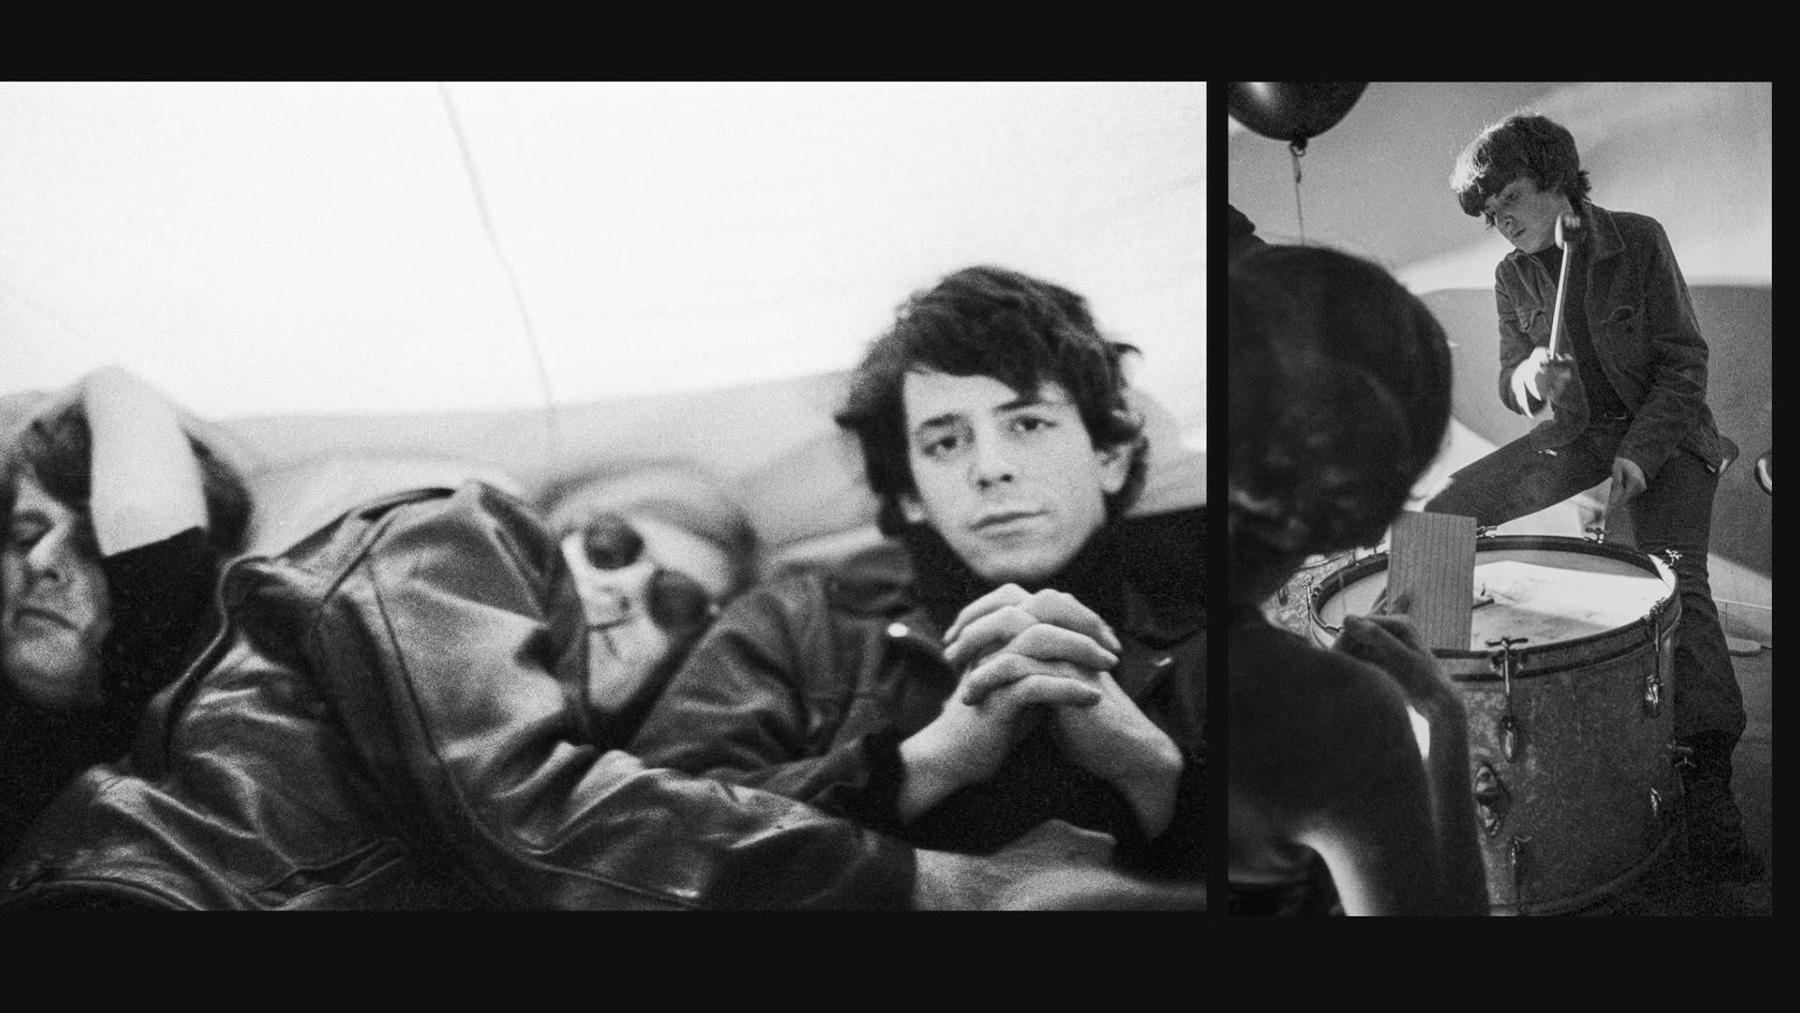 Paul Morrissey, Andy Warhol, Lou Reed and Moe Tucker velvet underground documentary